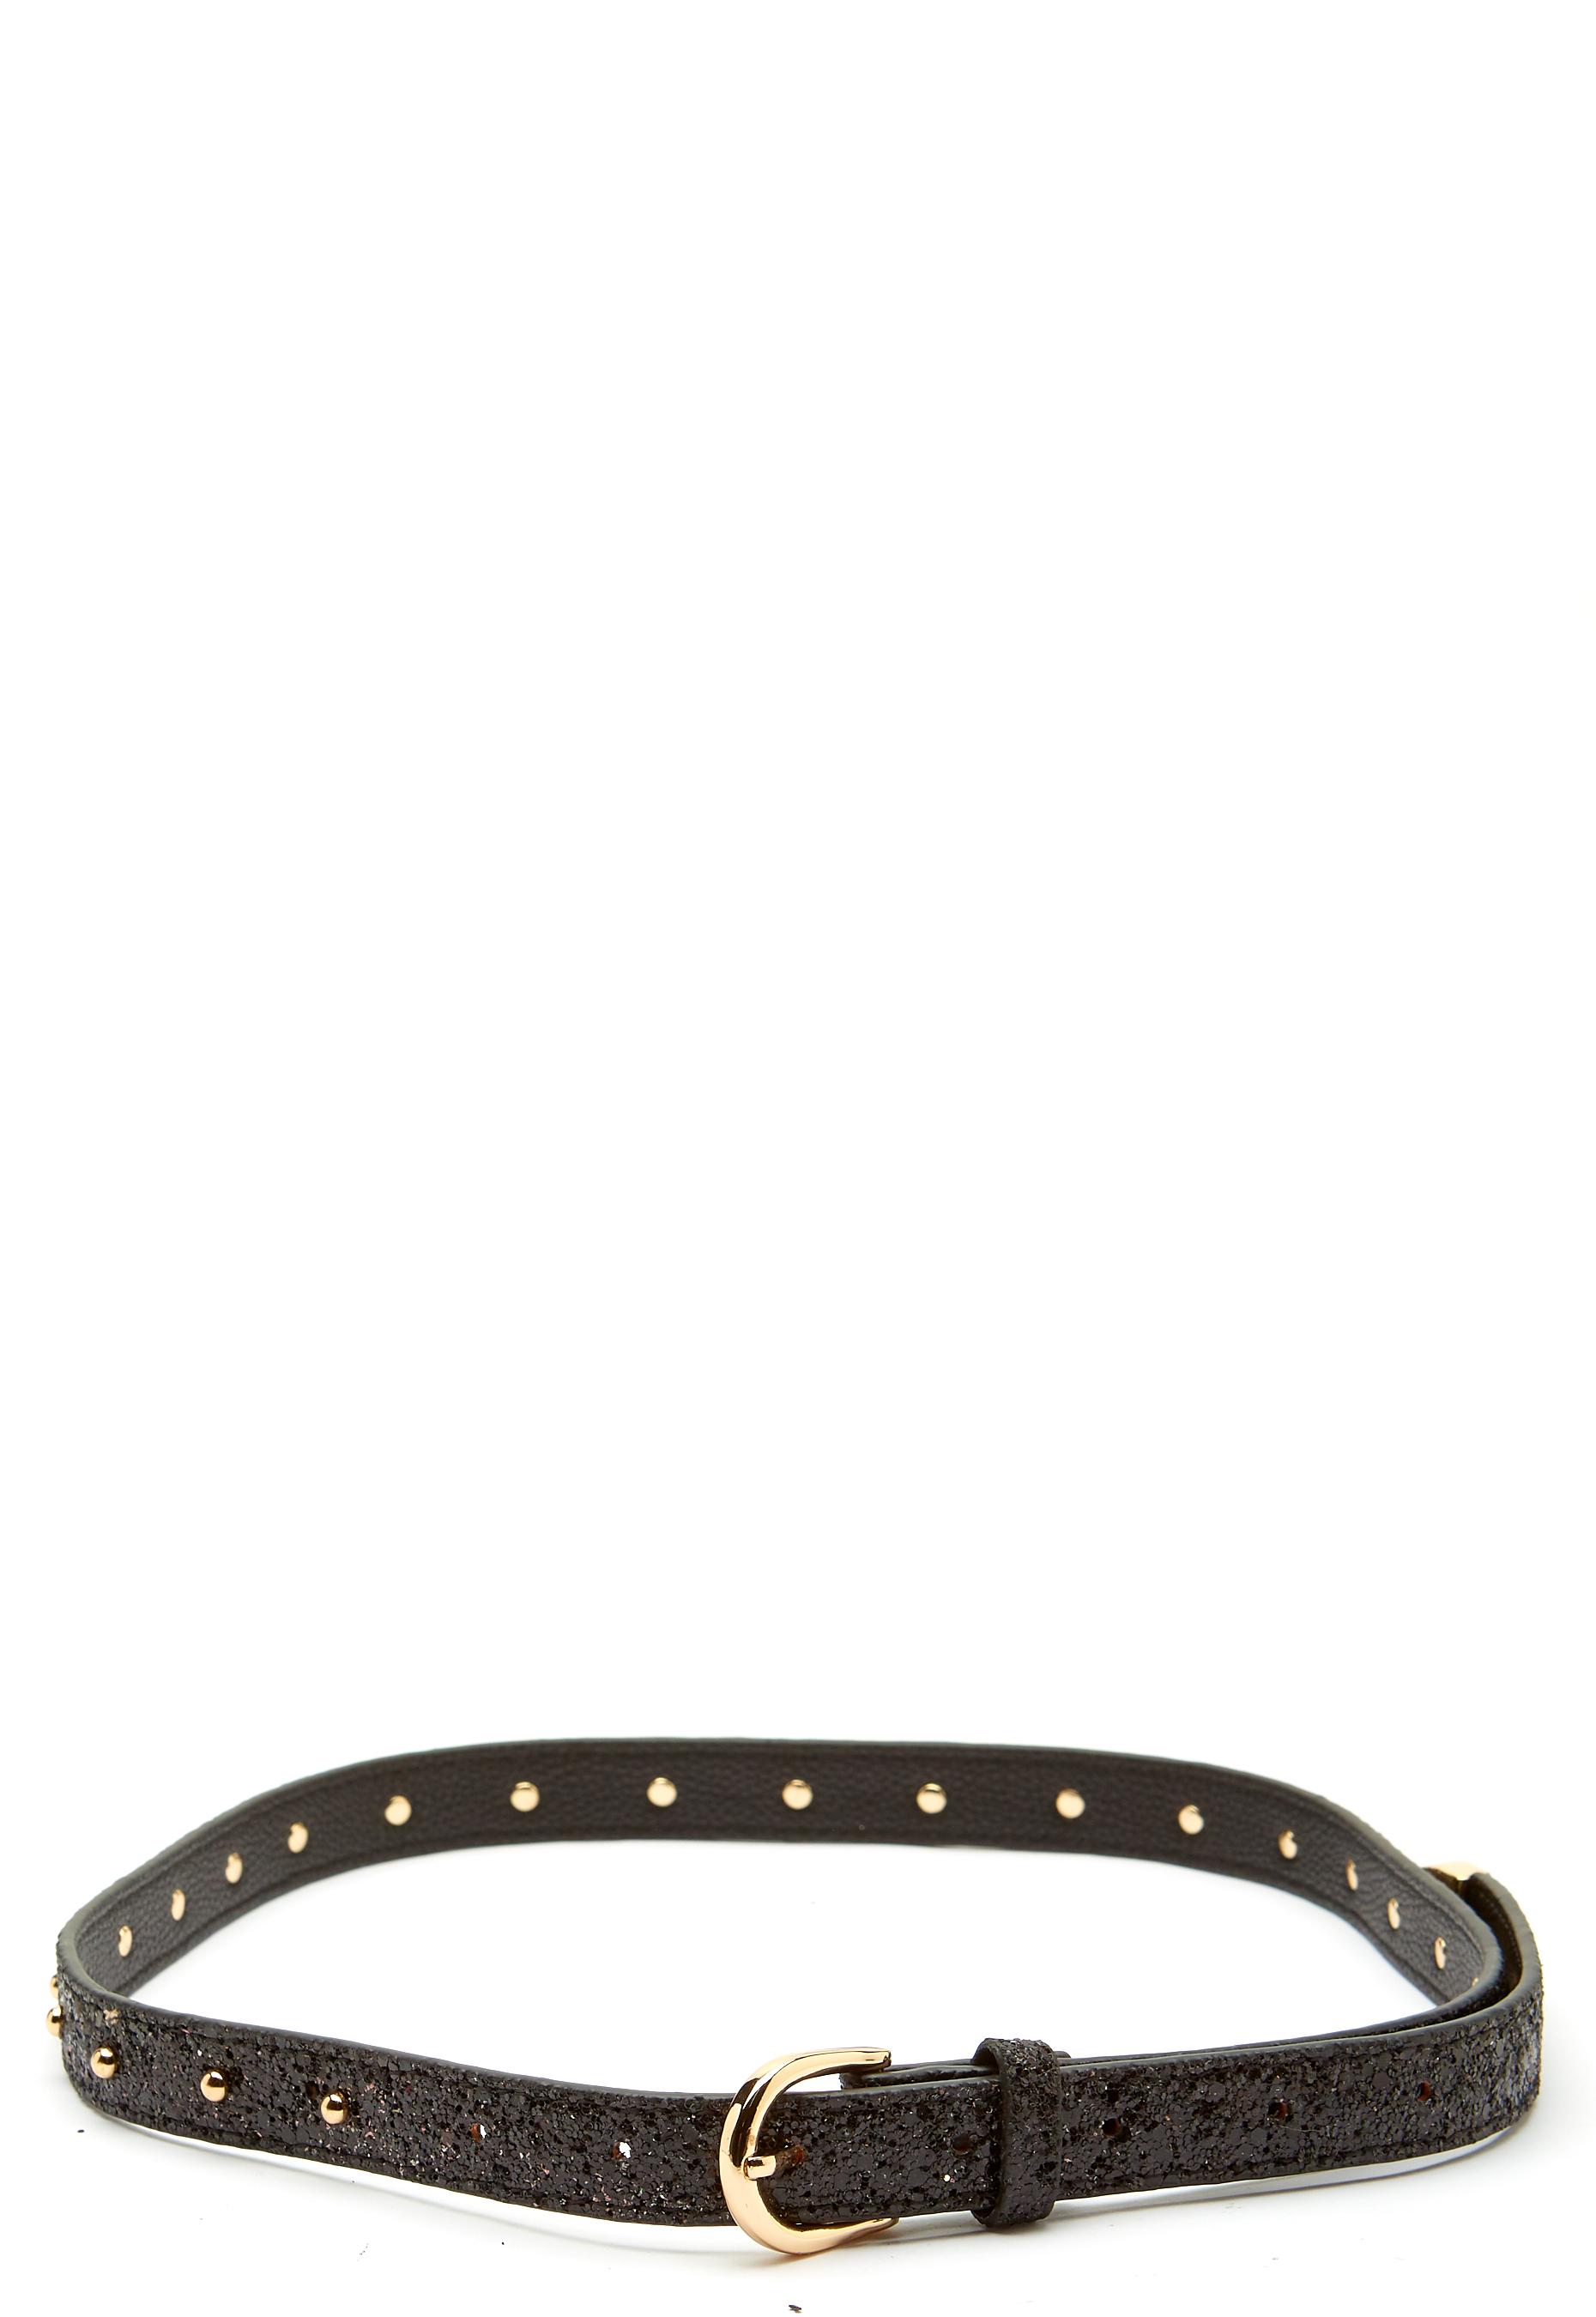 d781b4606f1 SOFIE SCHNOOR Belt Glitter Black - Bubbleroom